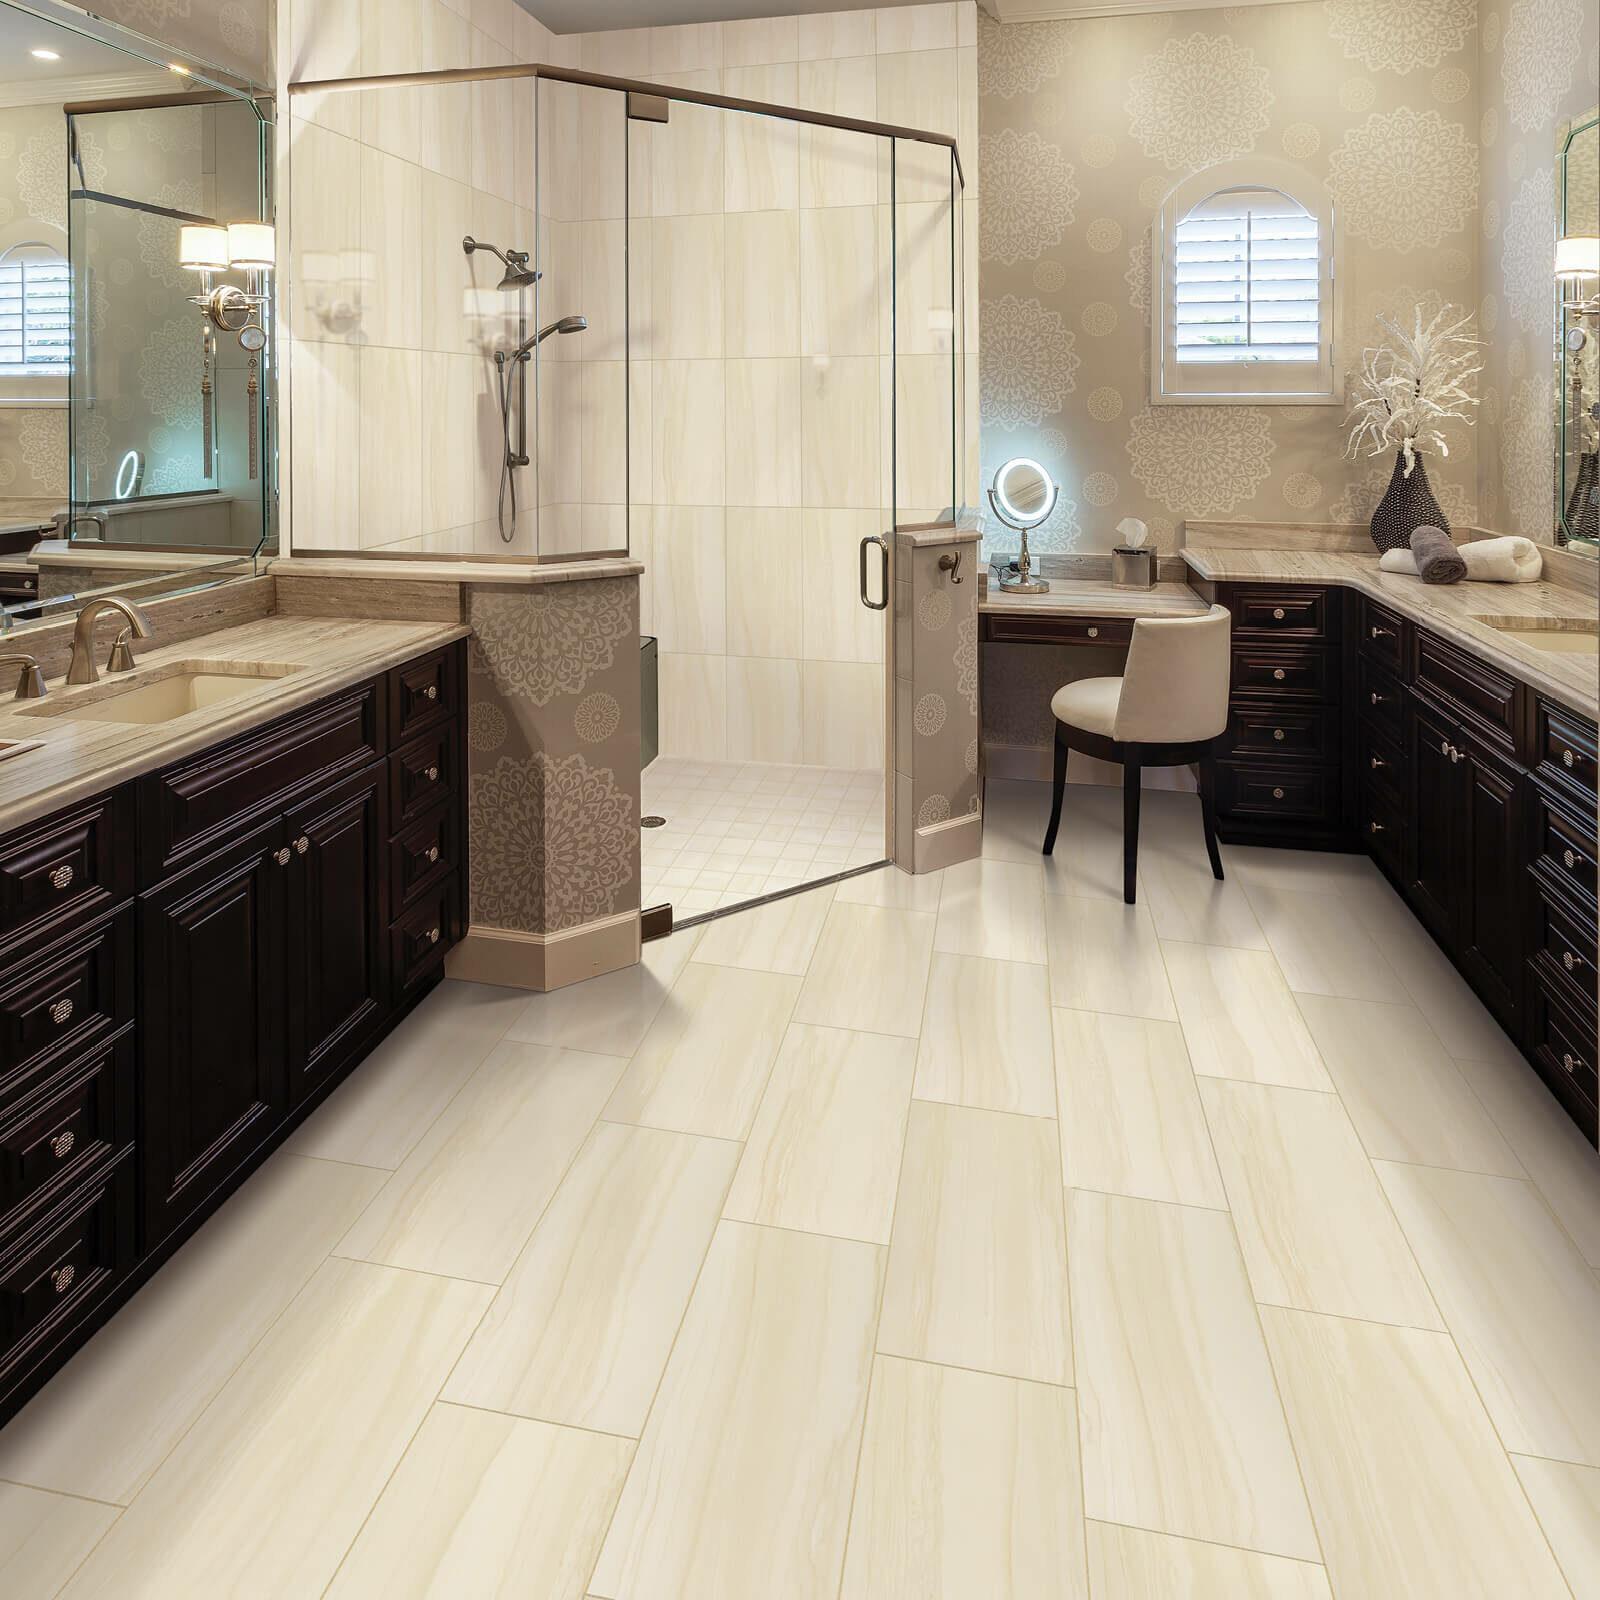 Tile flooring | Price Flooring